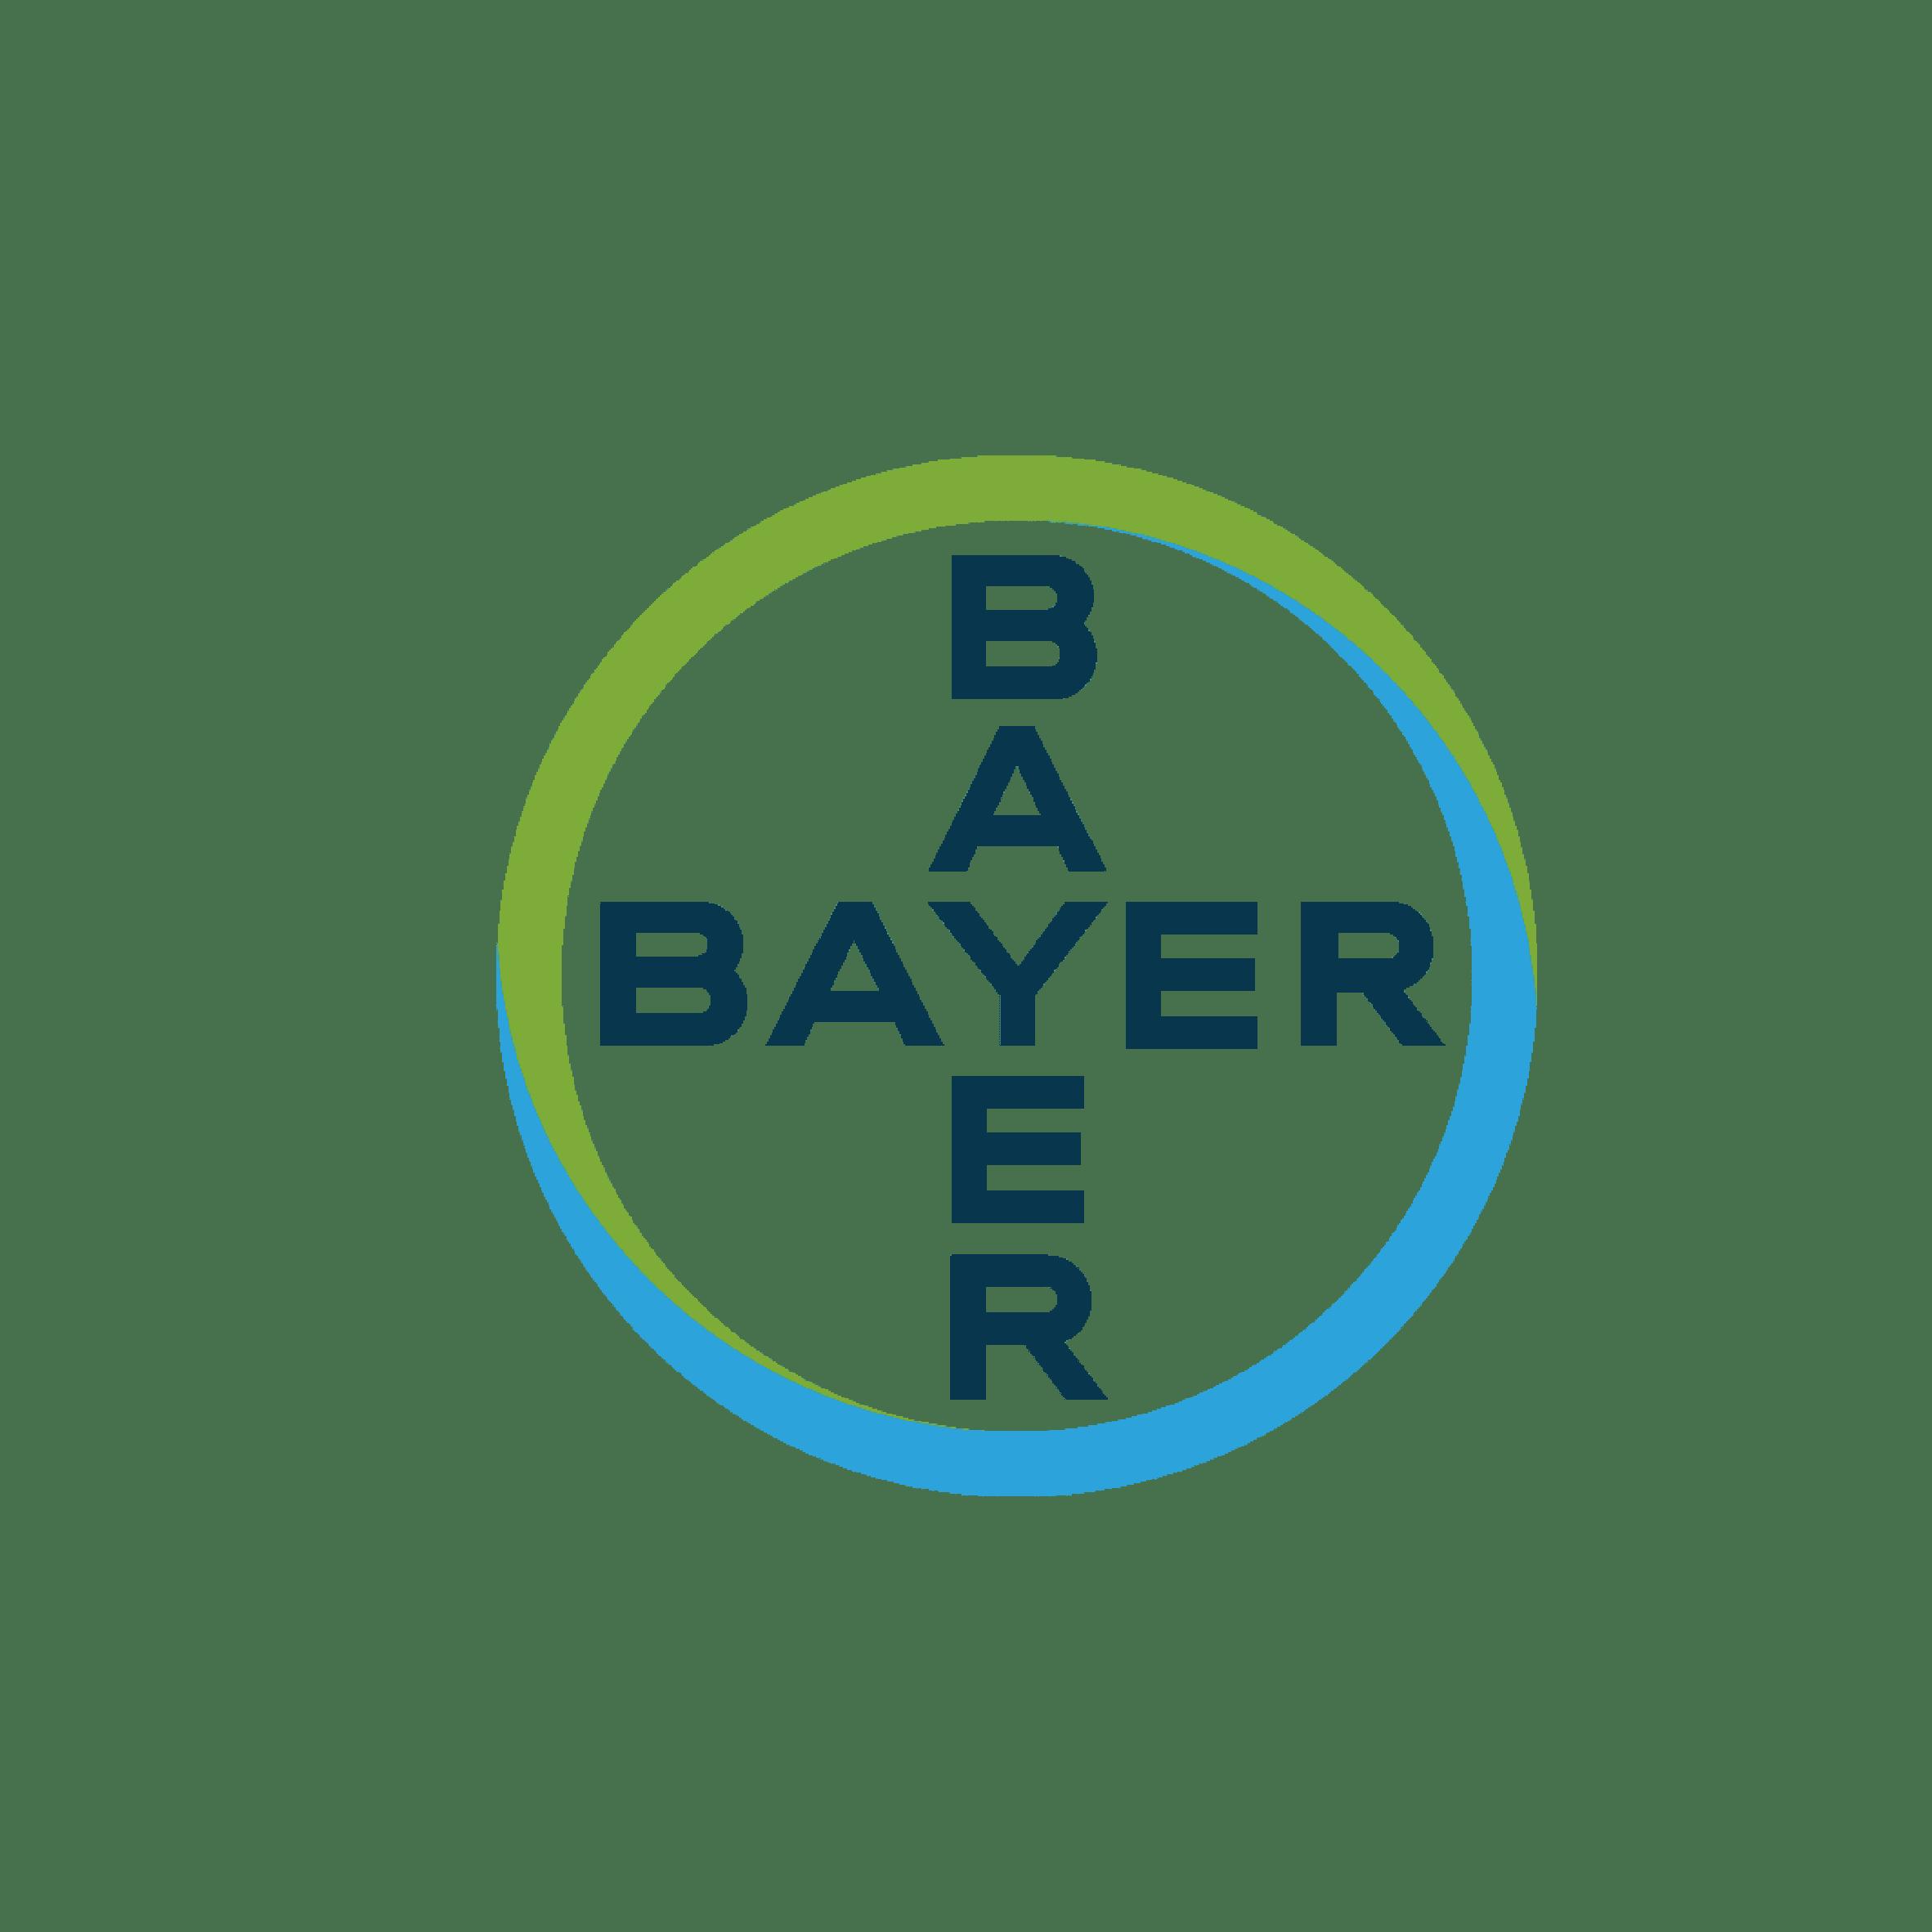 Responsabilidad Ambiental- Bayer